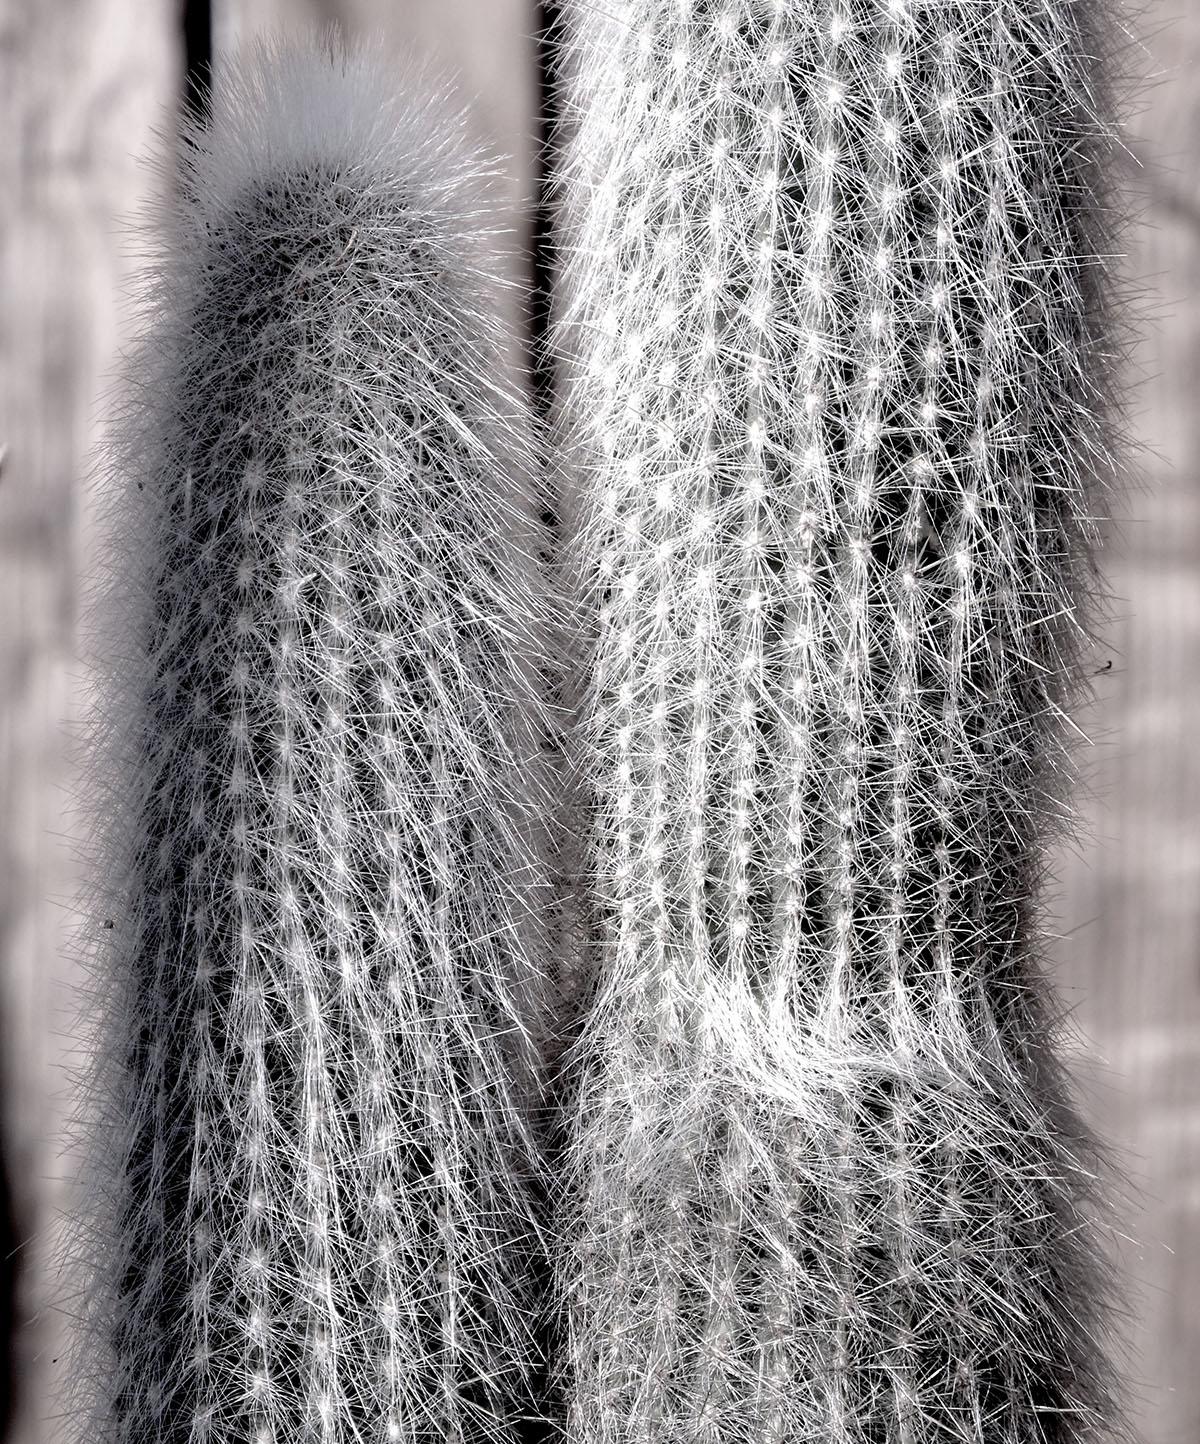 Cleistocactus strausii 1